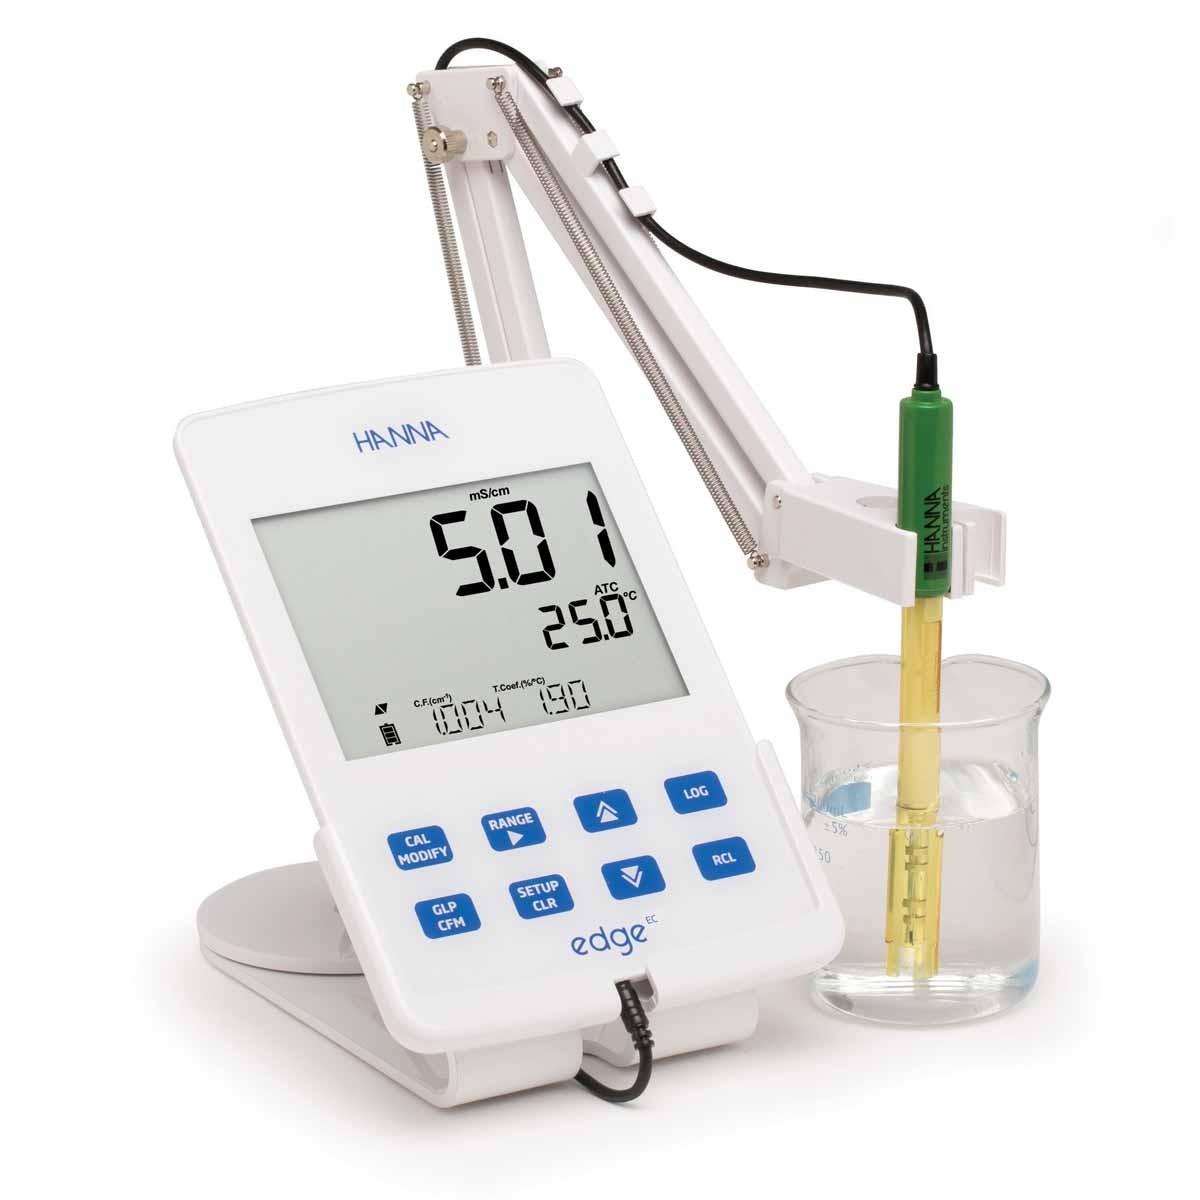 Hanna Instruments edge Dedicated Conductivity TDS Salinity Meter HI2003